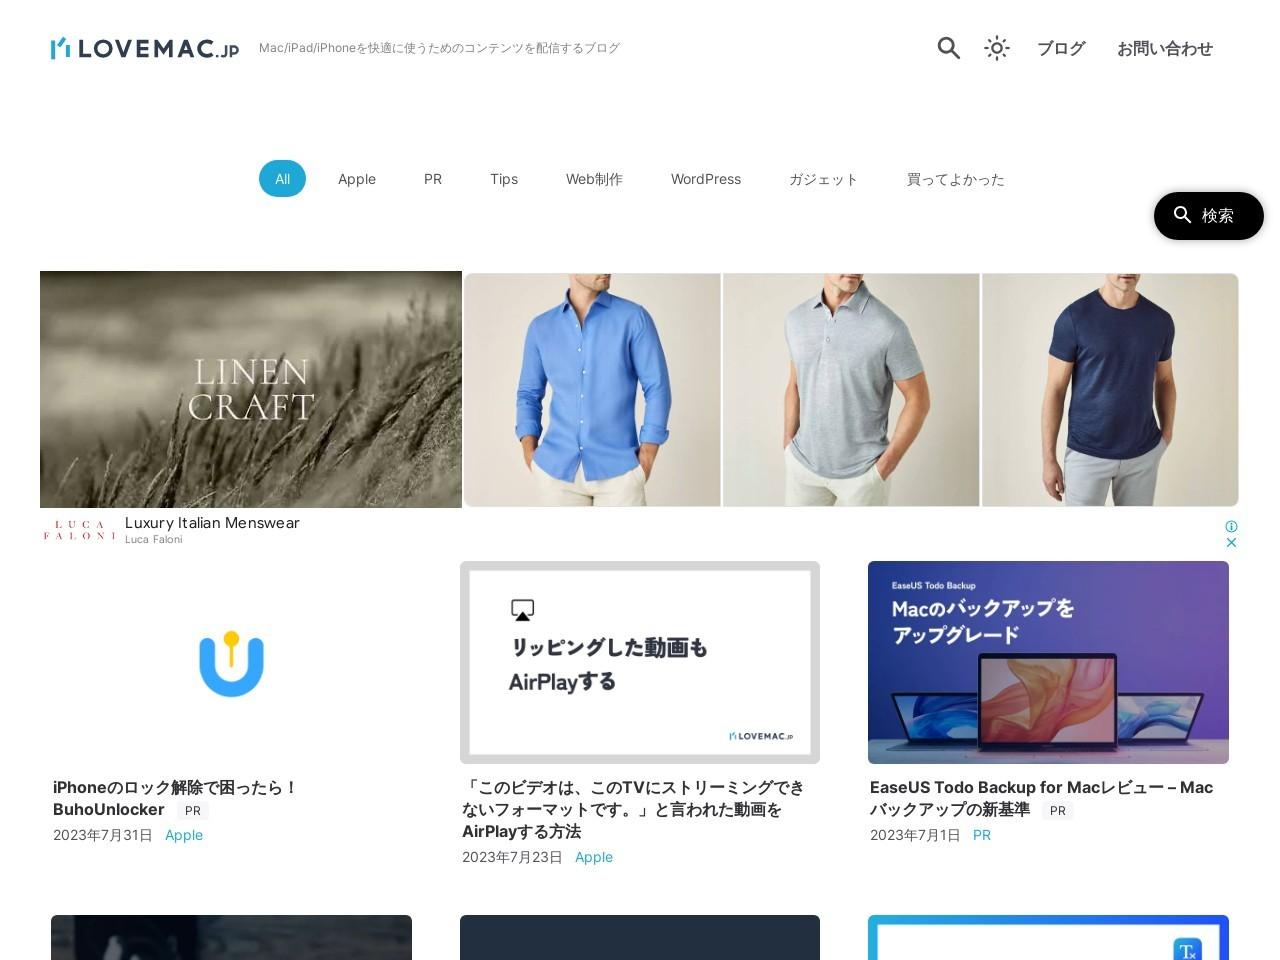 macOS Sierra「ユニバーサルクリップボード」でiOSとmacOS間での相互コピペが可能に。 | loveMac.jp